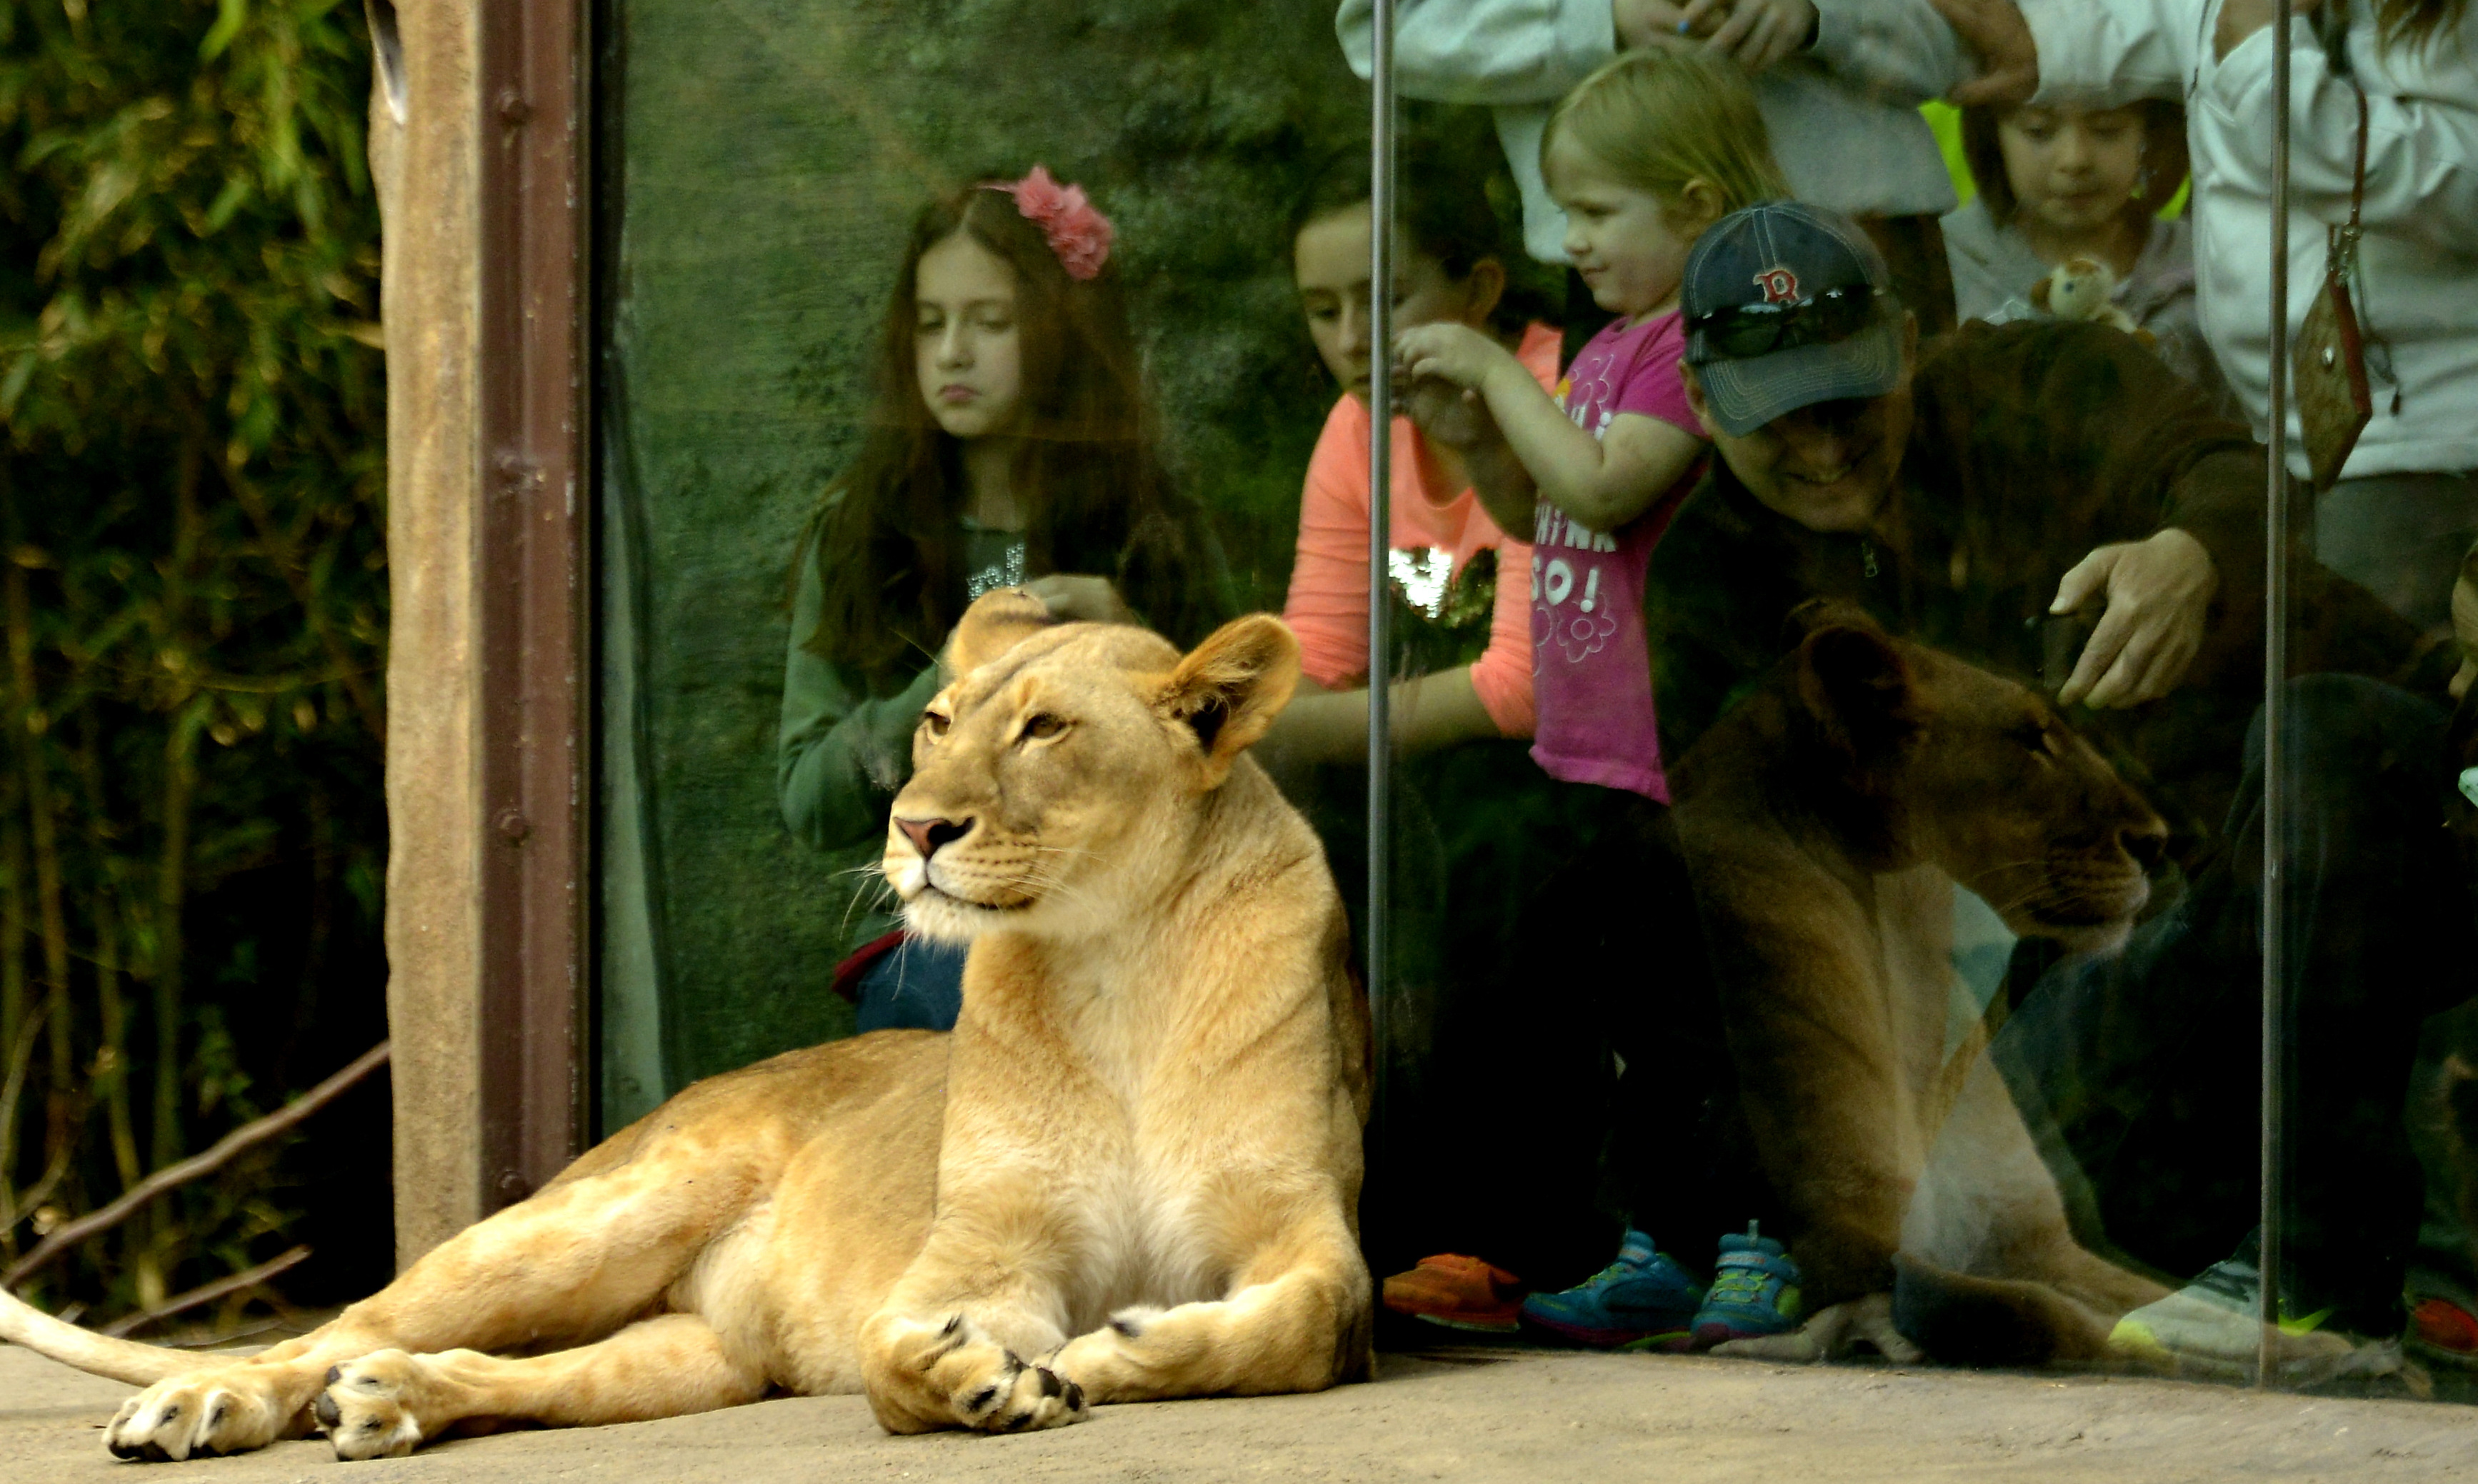 Shopping & Dining – The Cincinnati Zoo & Botanical Garden